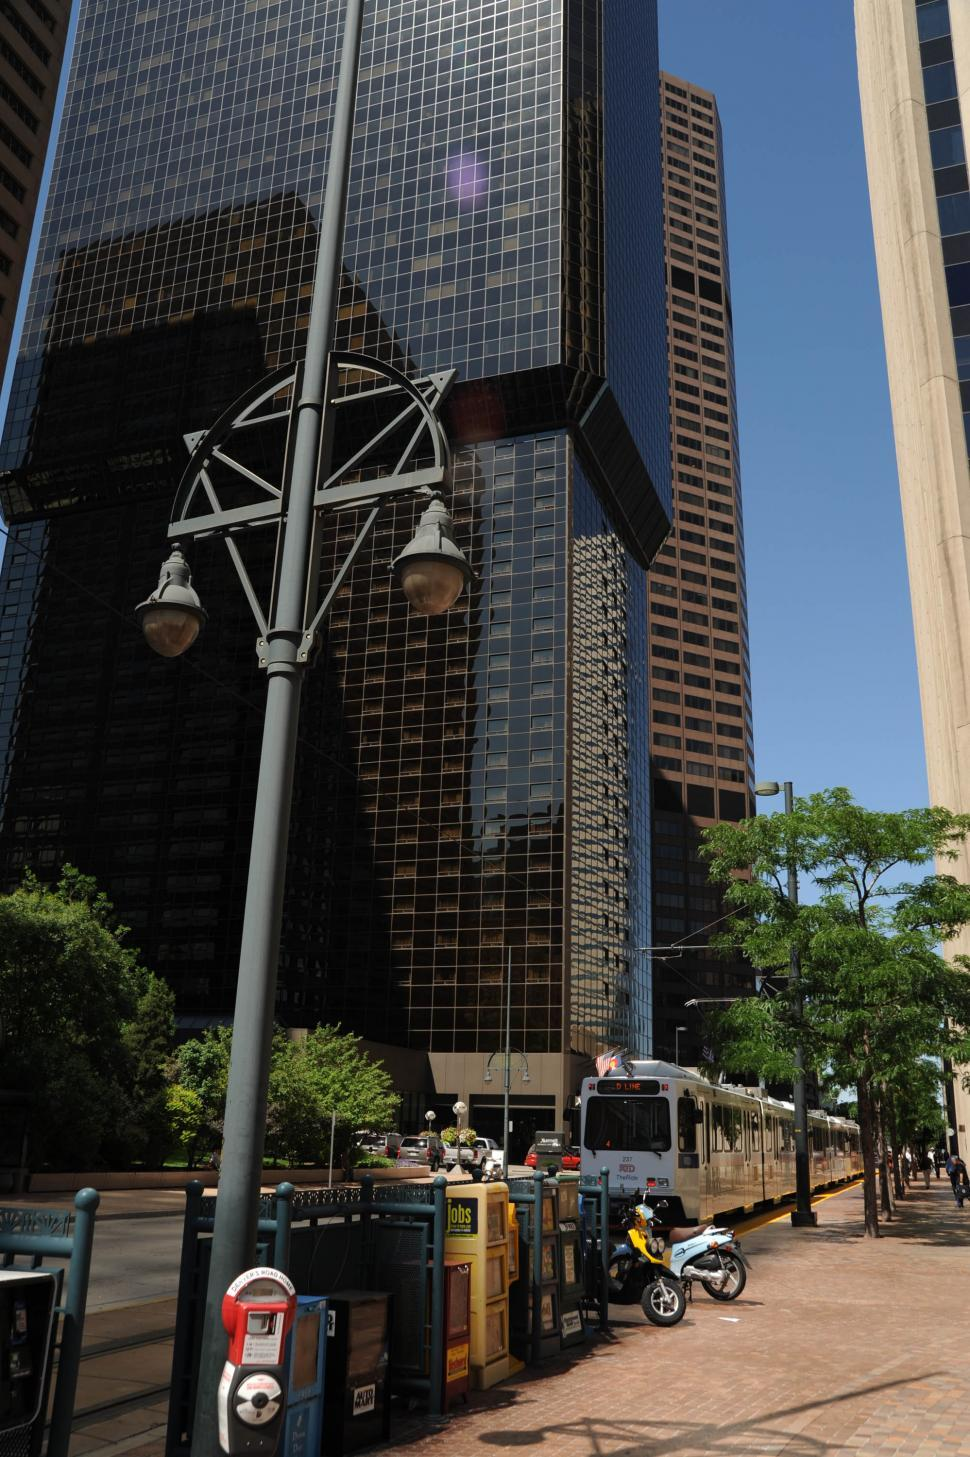 Download Free Stock HD Photo of City sidewalk - Denver Online